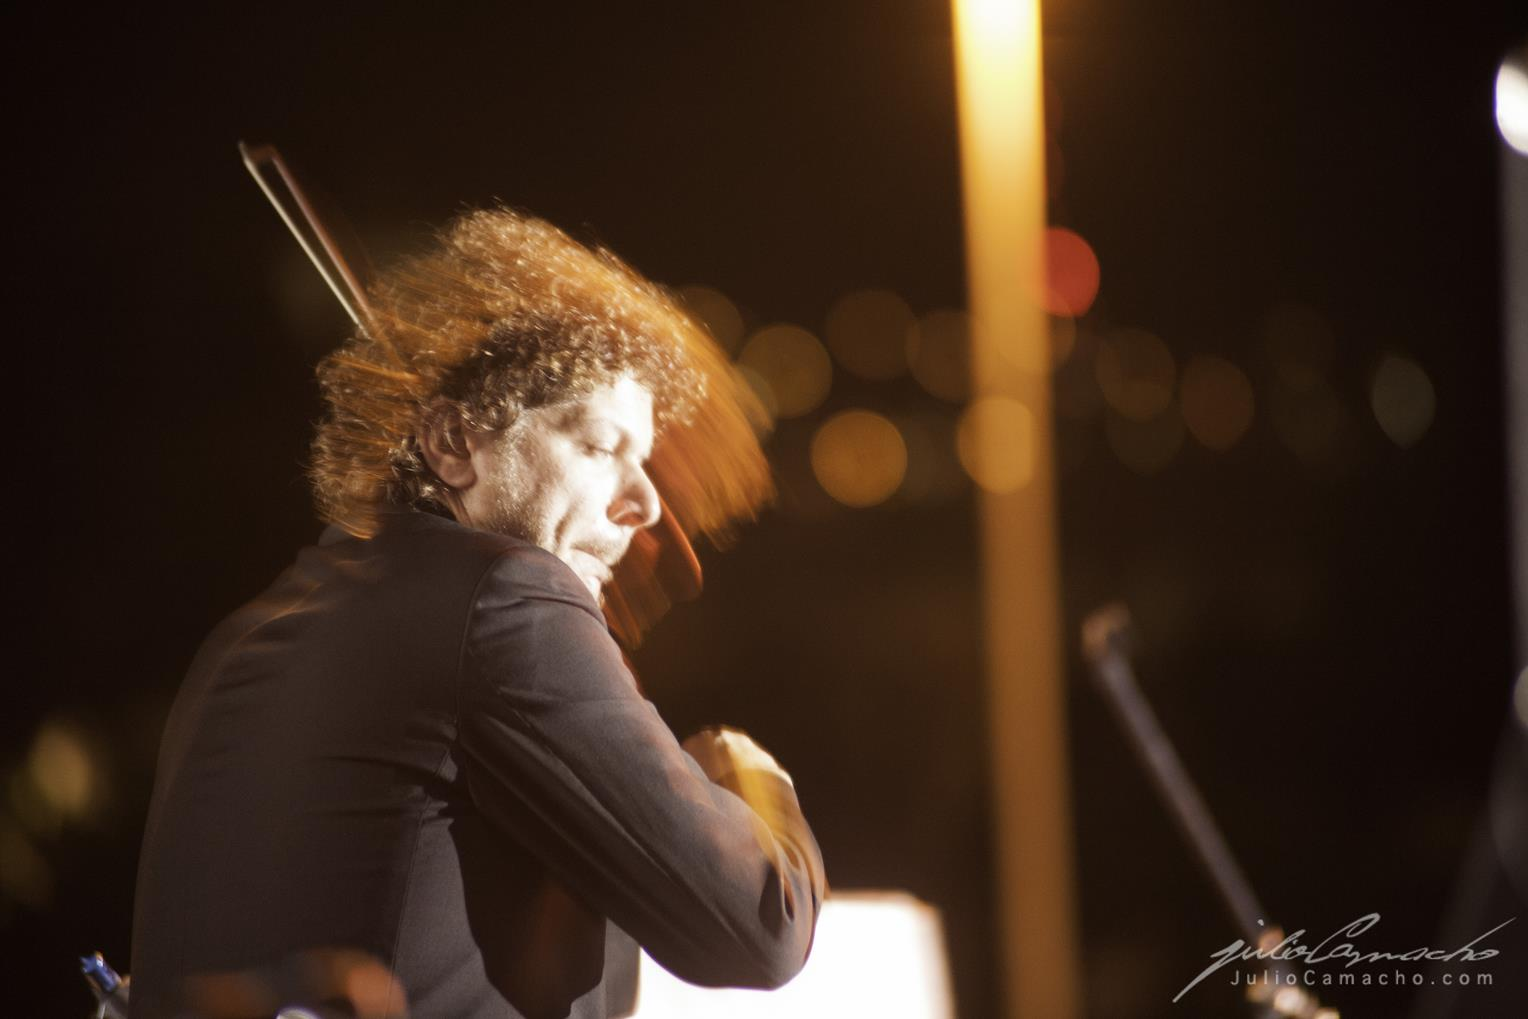 2014-10-30 31 CAST TOUR Ensenada y Tijuana - 0814 - www.Juli (Copy).jpg